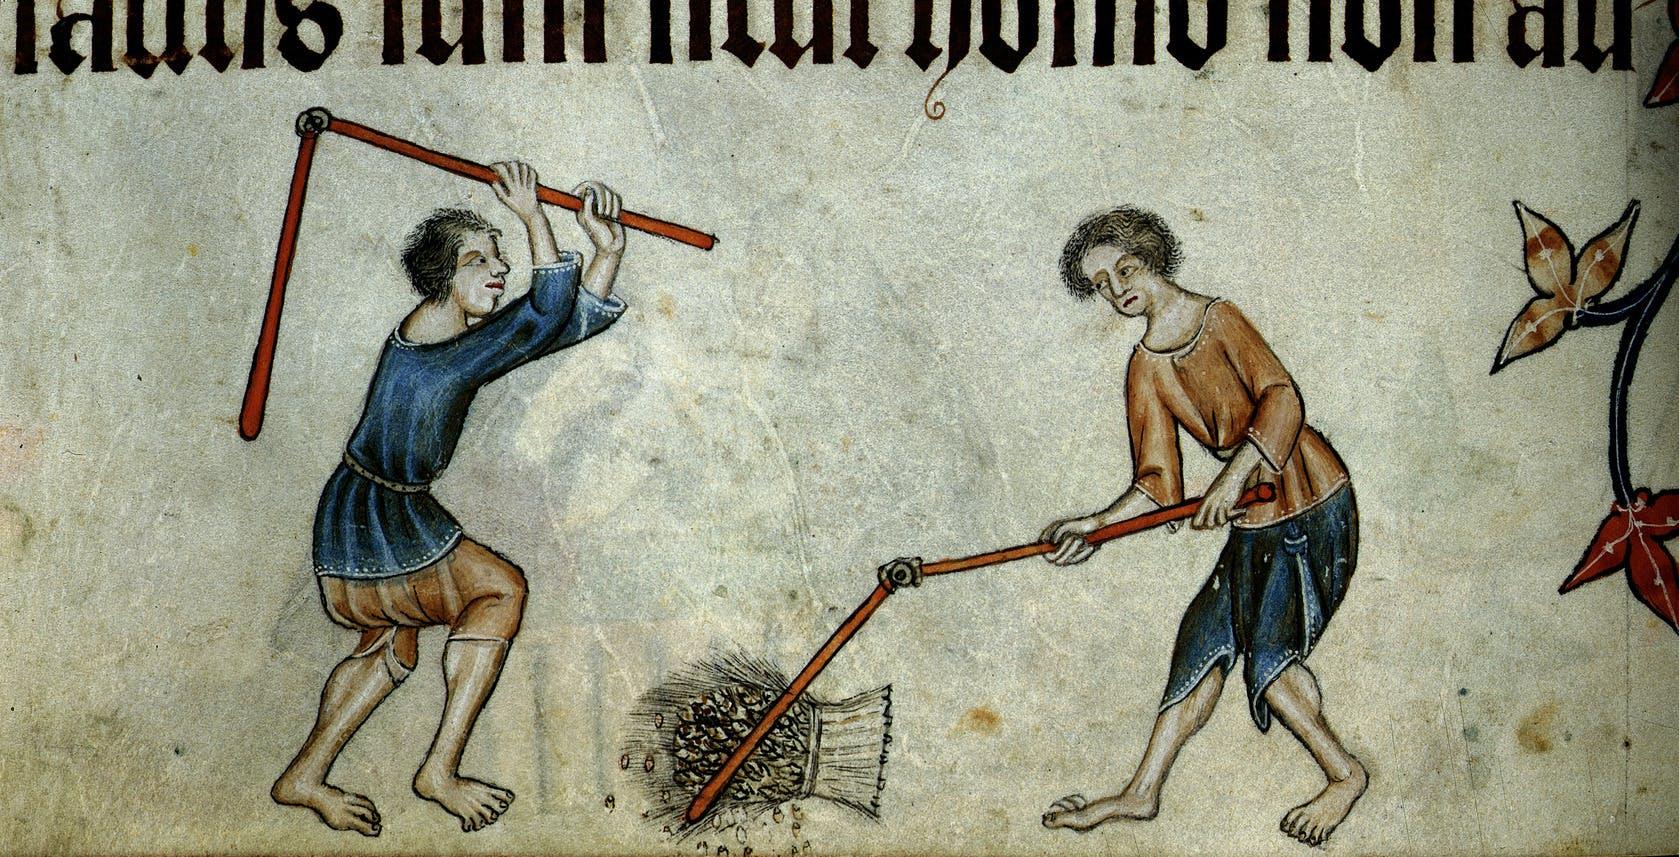 Tough day job: threshing wheat.